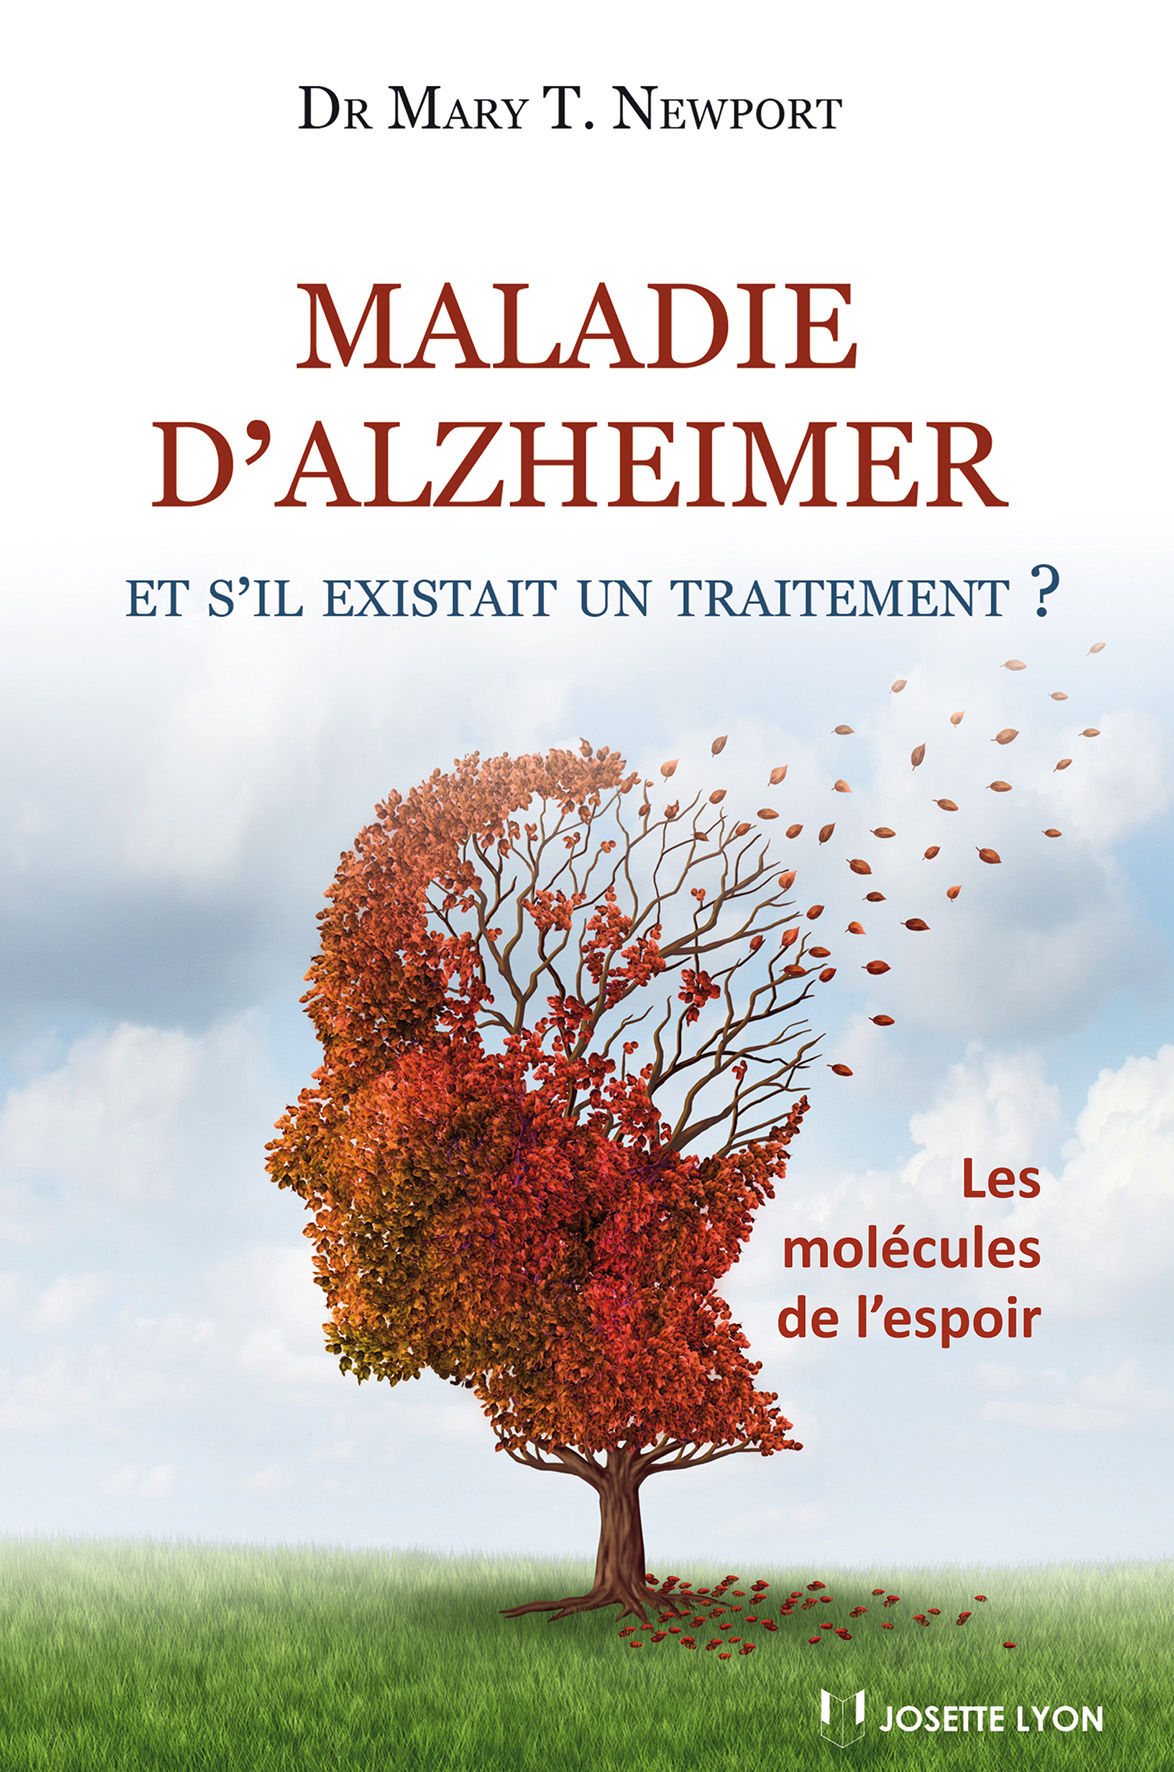 Alzheimer-traitement-santecool